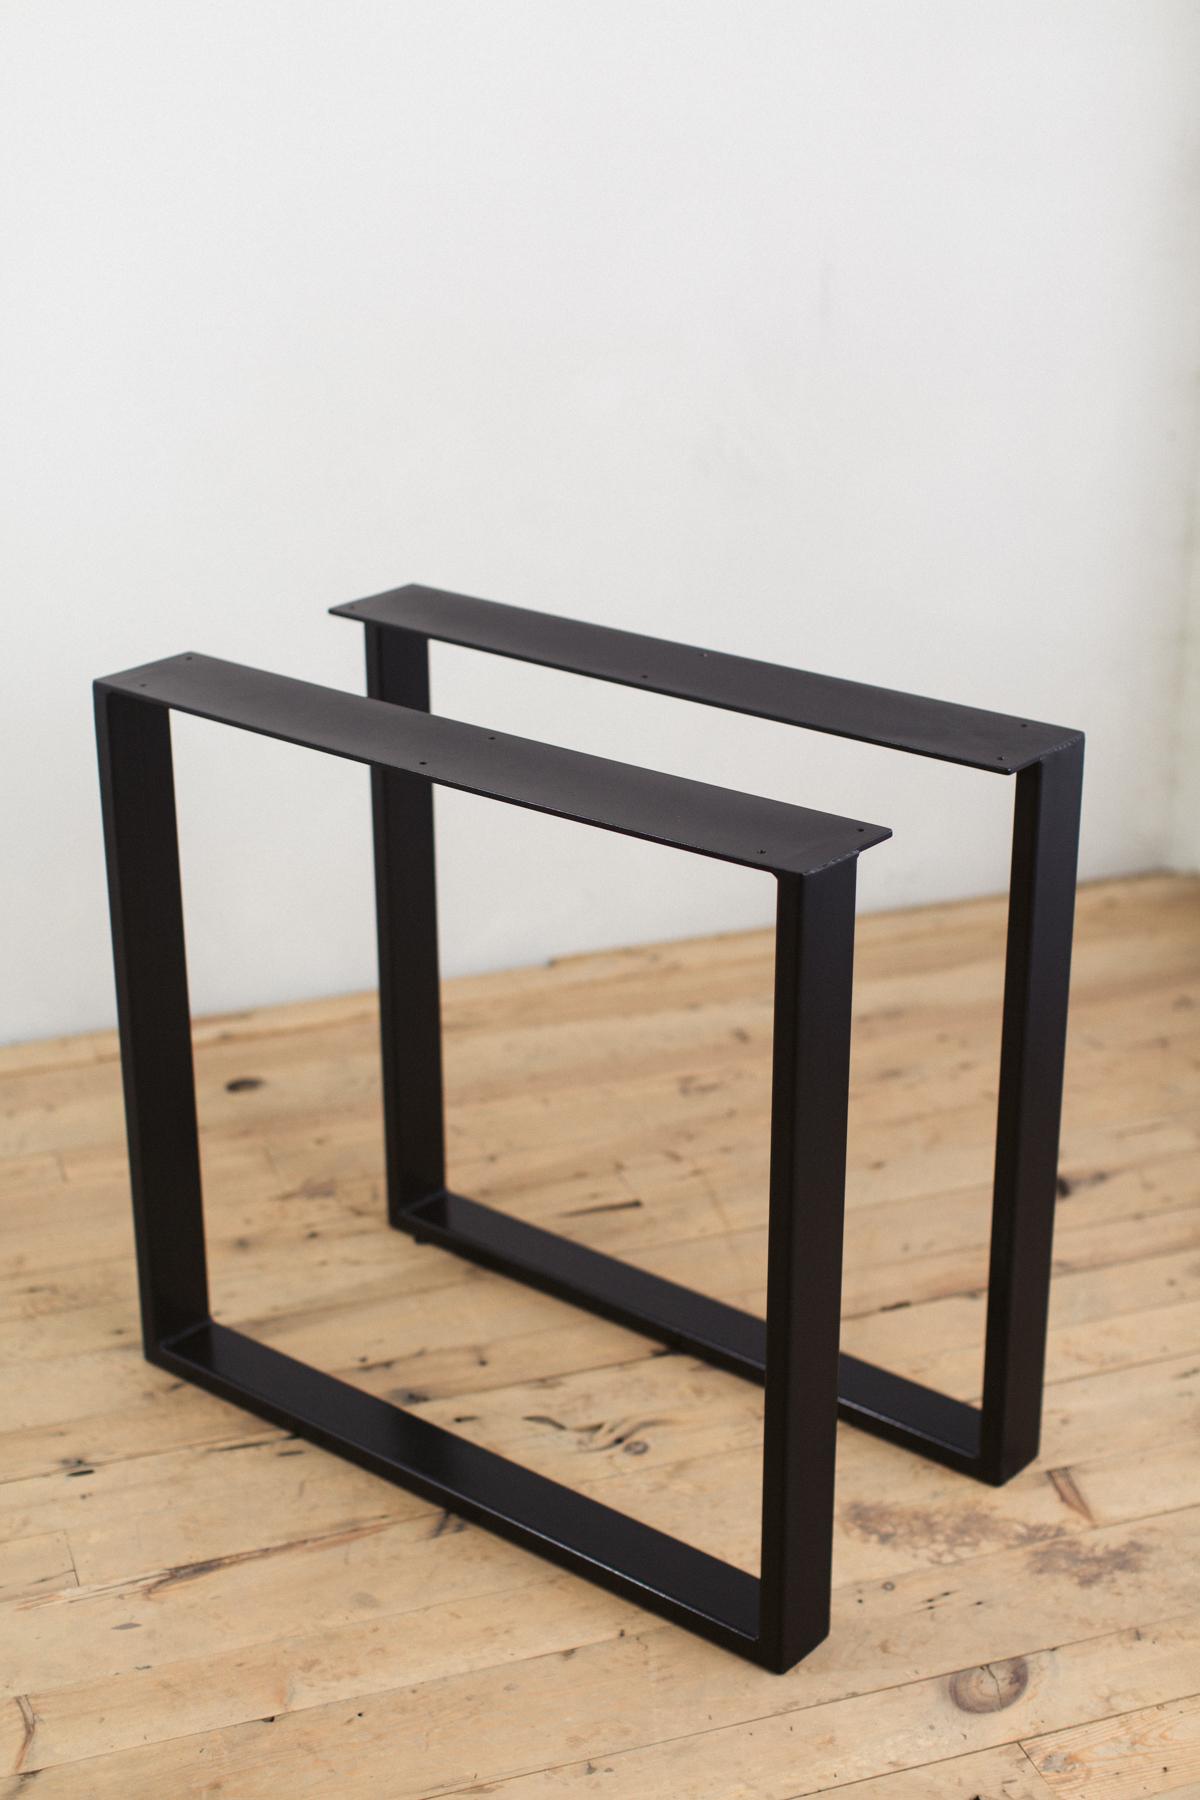 steel chair olx teal blue powder coated u shape table legs factor fabrication